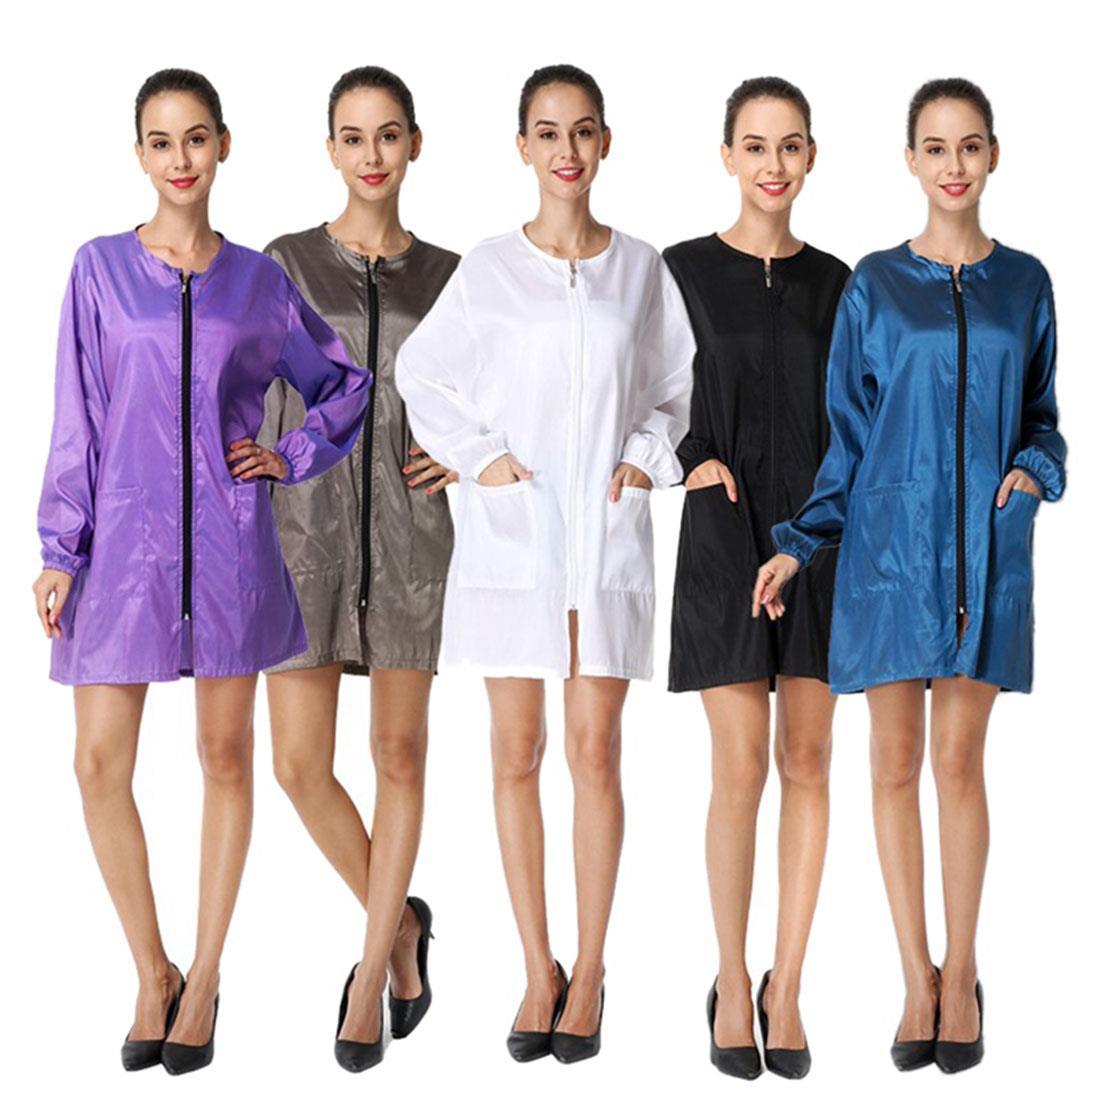 Women Dress Womens Long Sleeve Work Clothes O Neck Wind Jacket Barber Shop Aprons Hairdressing Waterproof Workwear Beauty Spa Apron